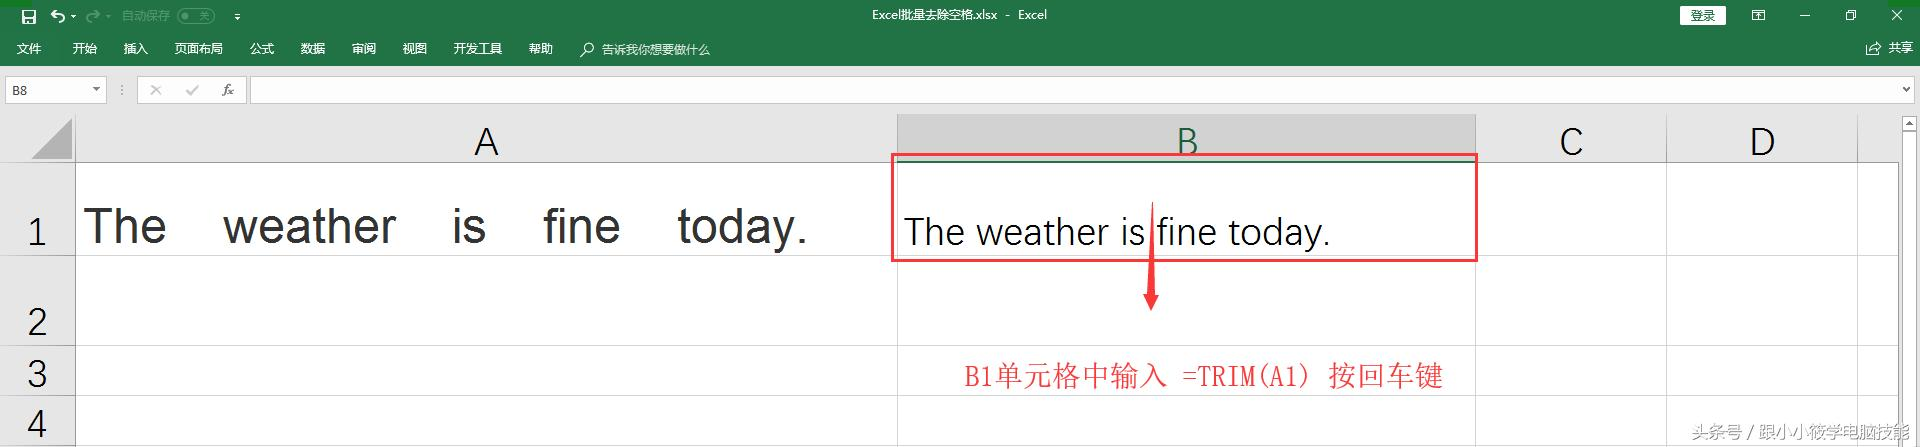 「Excel技巧」一分钟教你学会Excel批量去除空格!